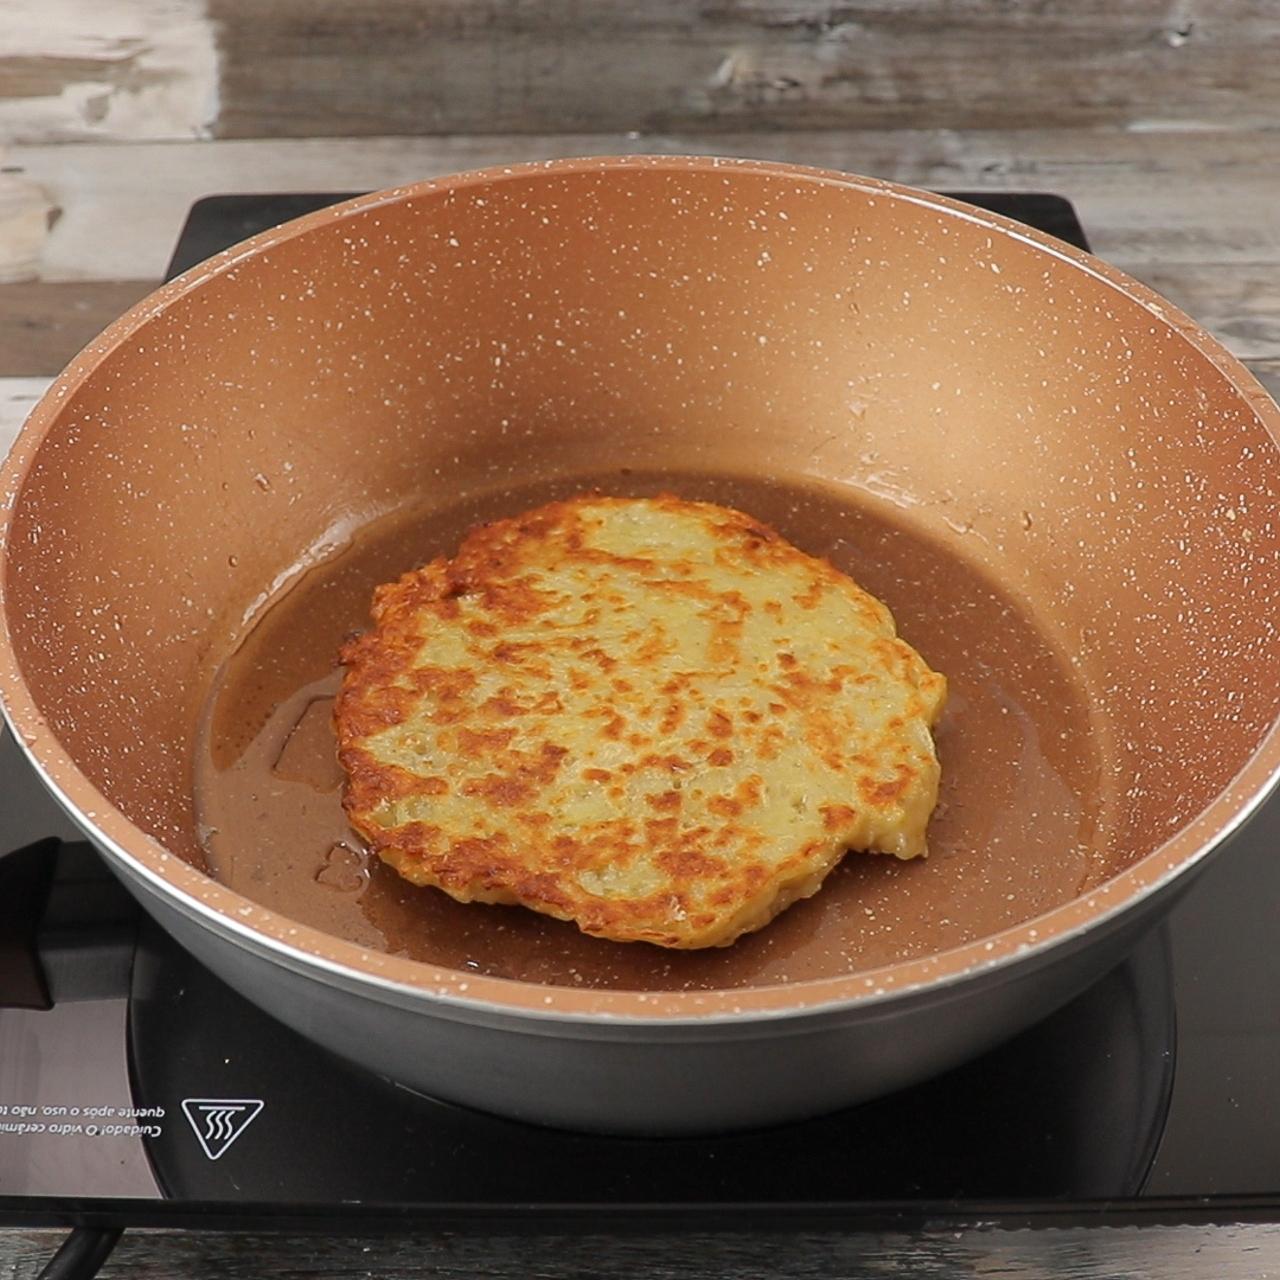 Torta Rápida de Batata na Frigideira, Prática e Deliciosa